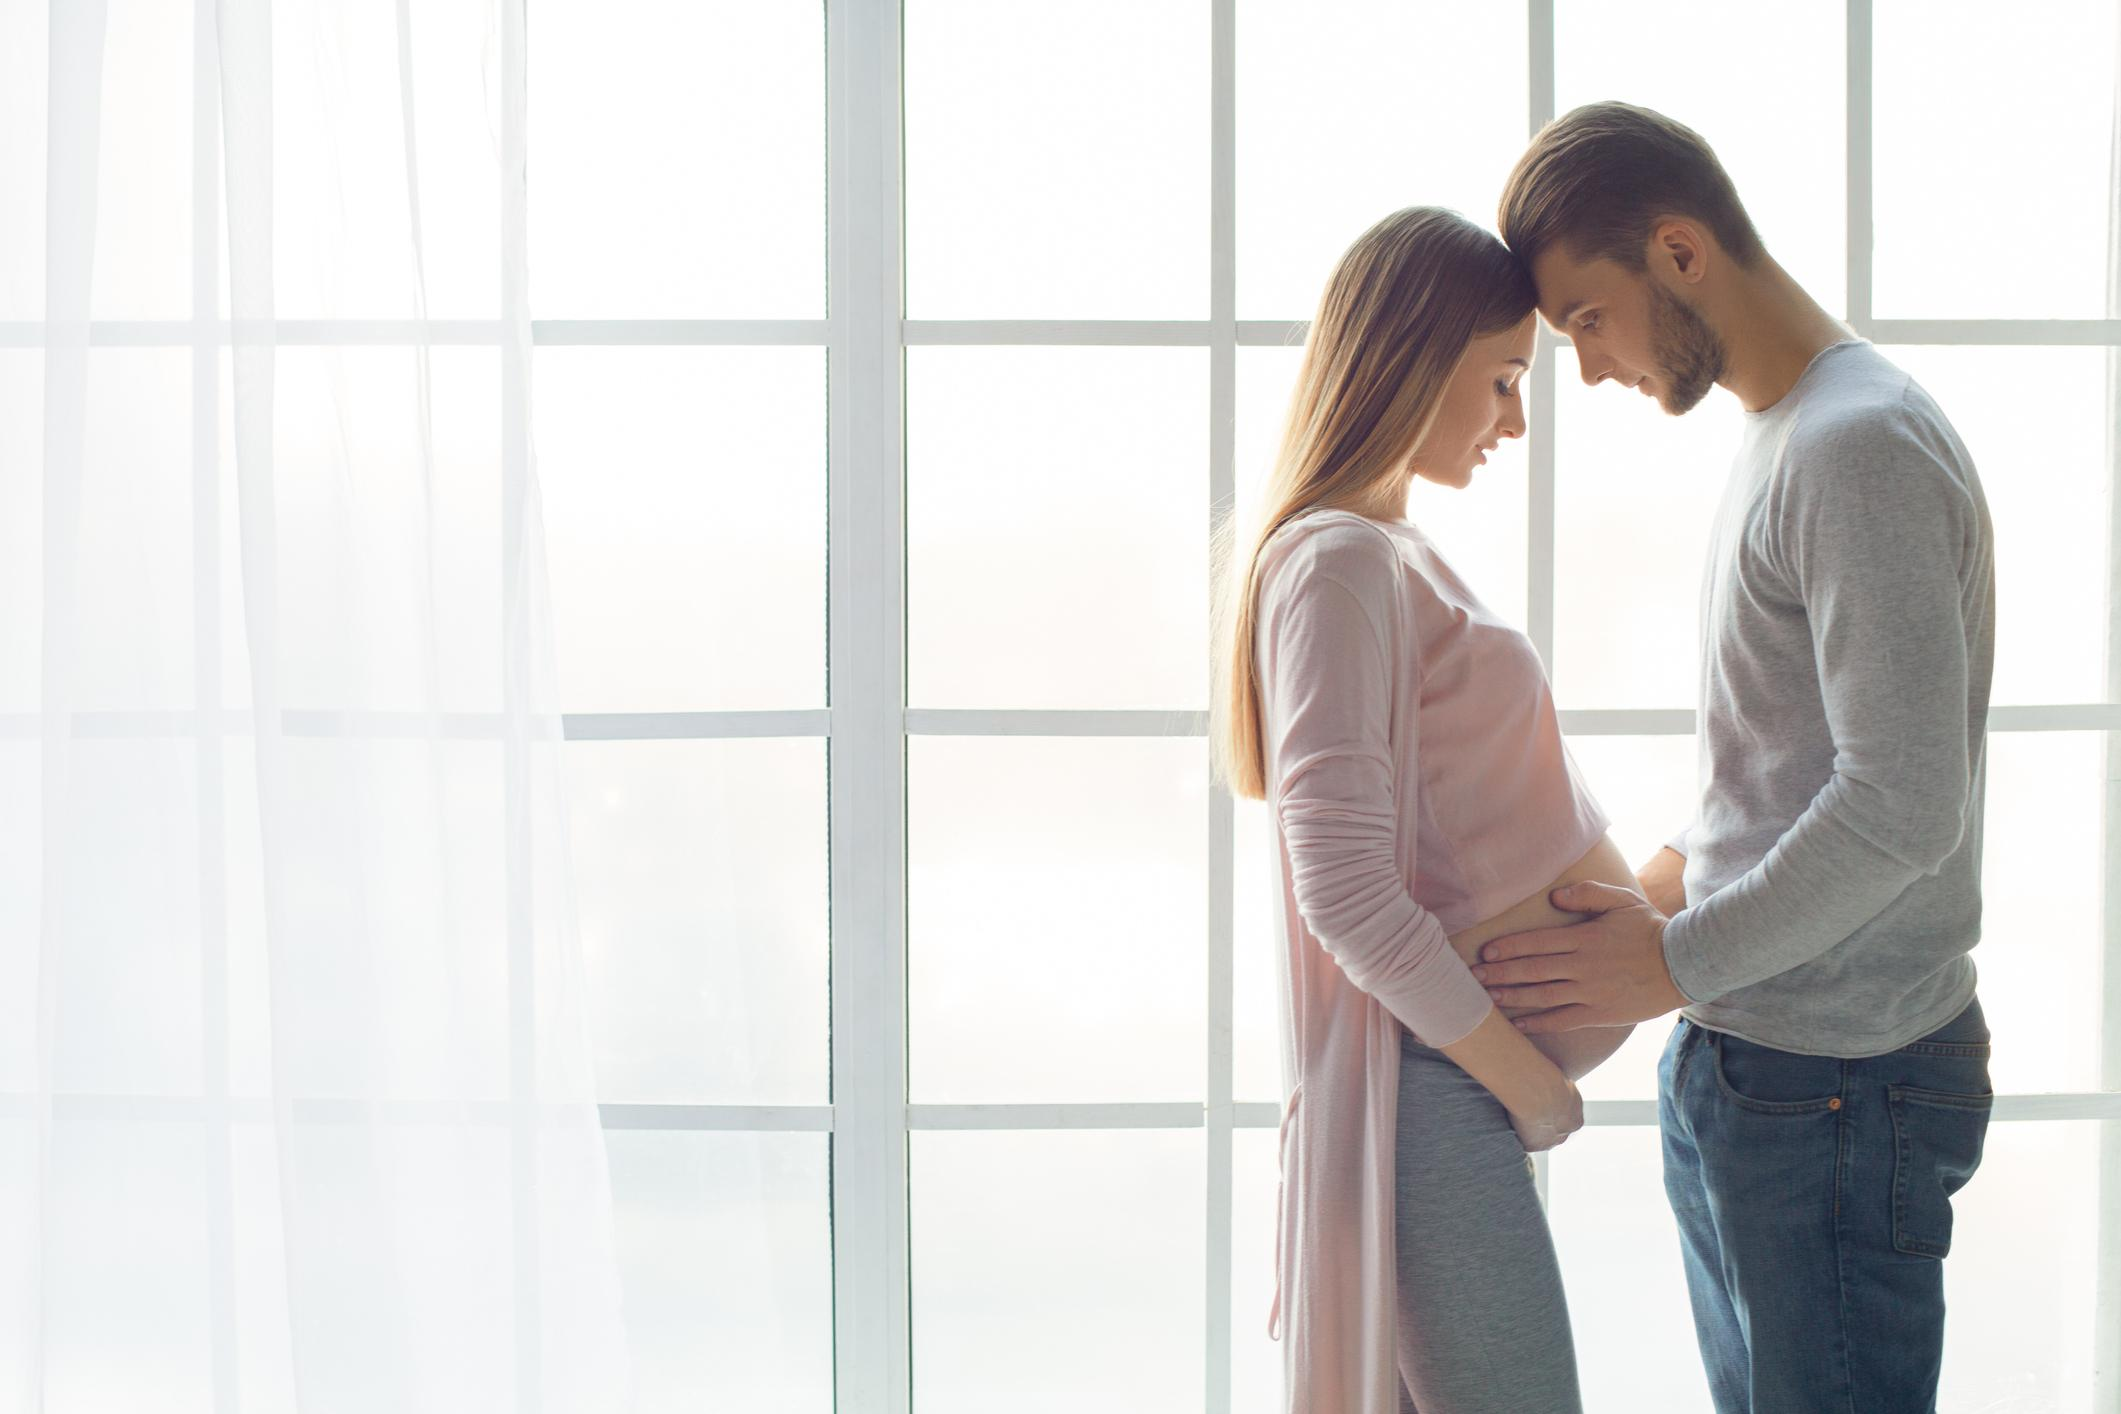 pregnant-wife1-1556724137704.jpg